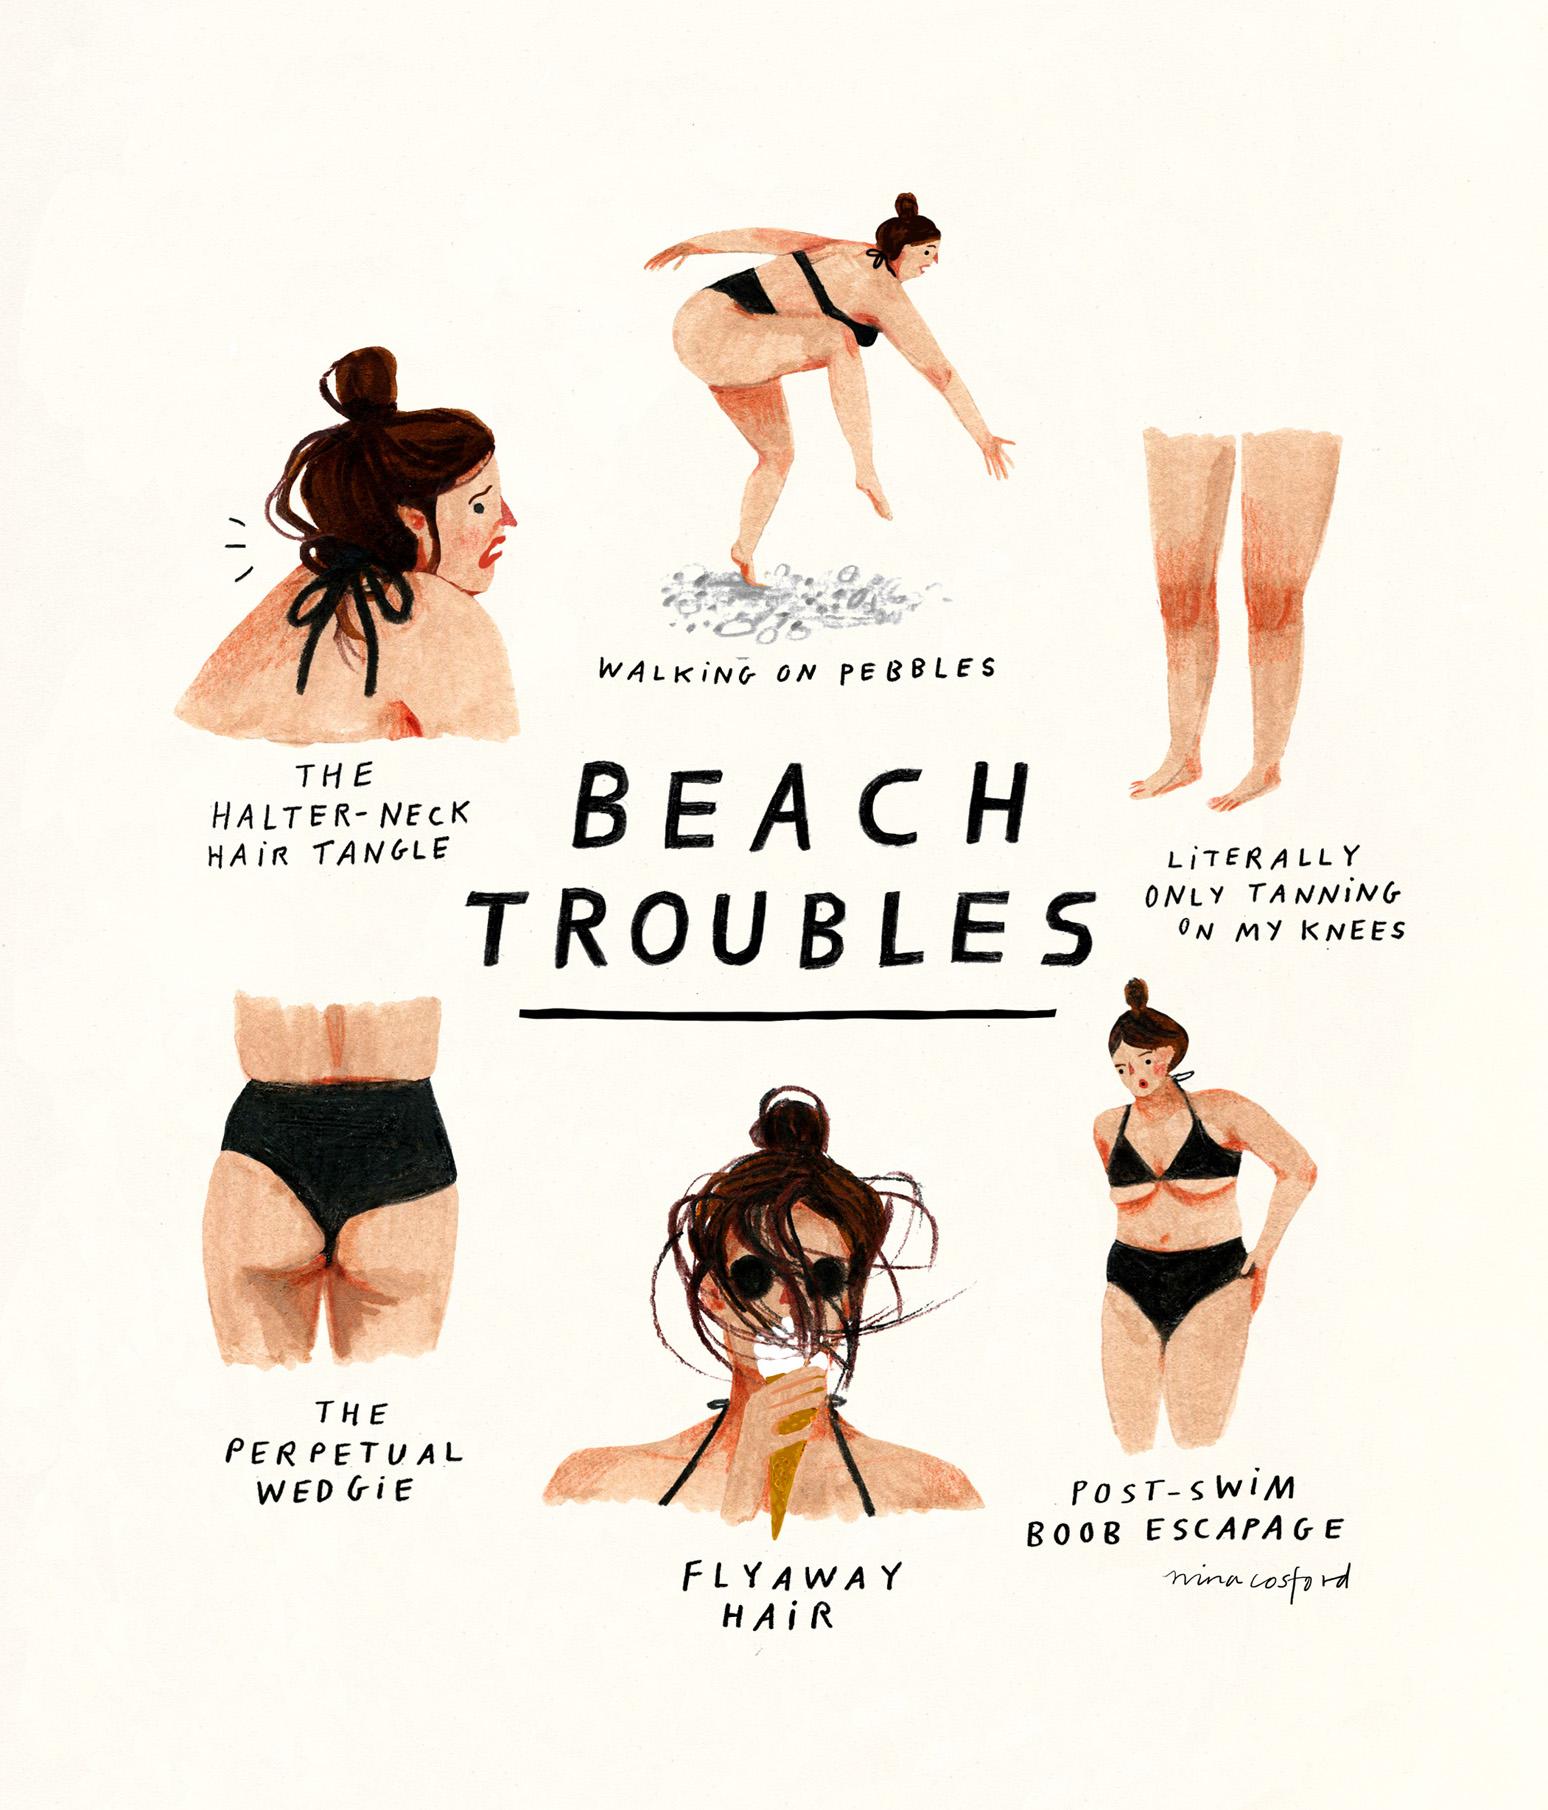 BEACH TROUBLES